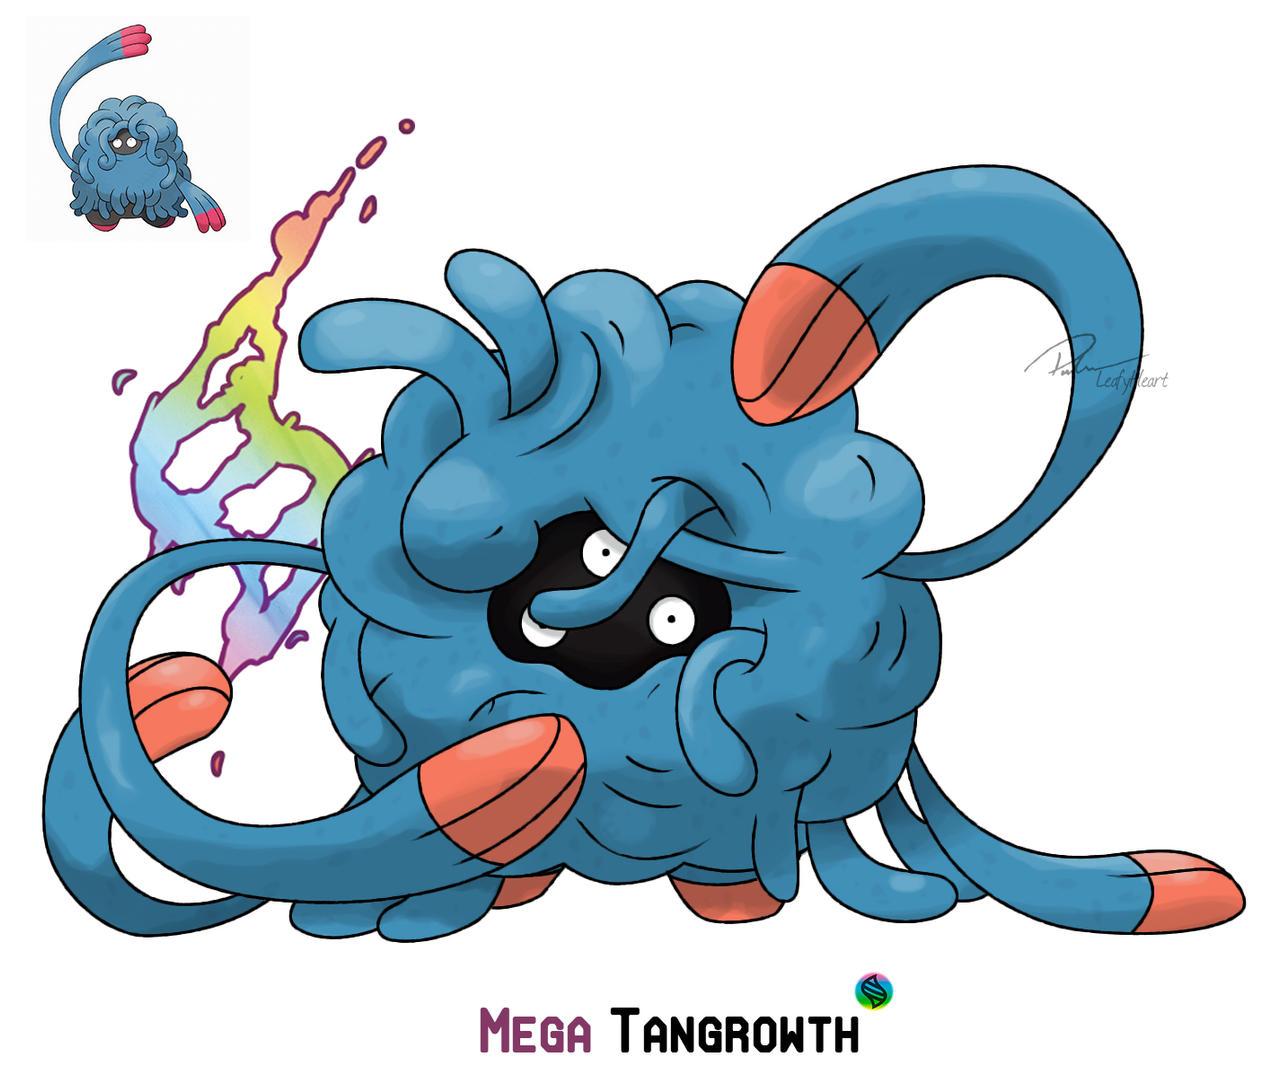 Mega Tangrowth by LeafyHeart on DeviantArt